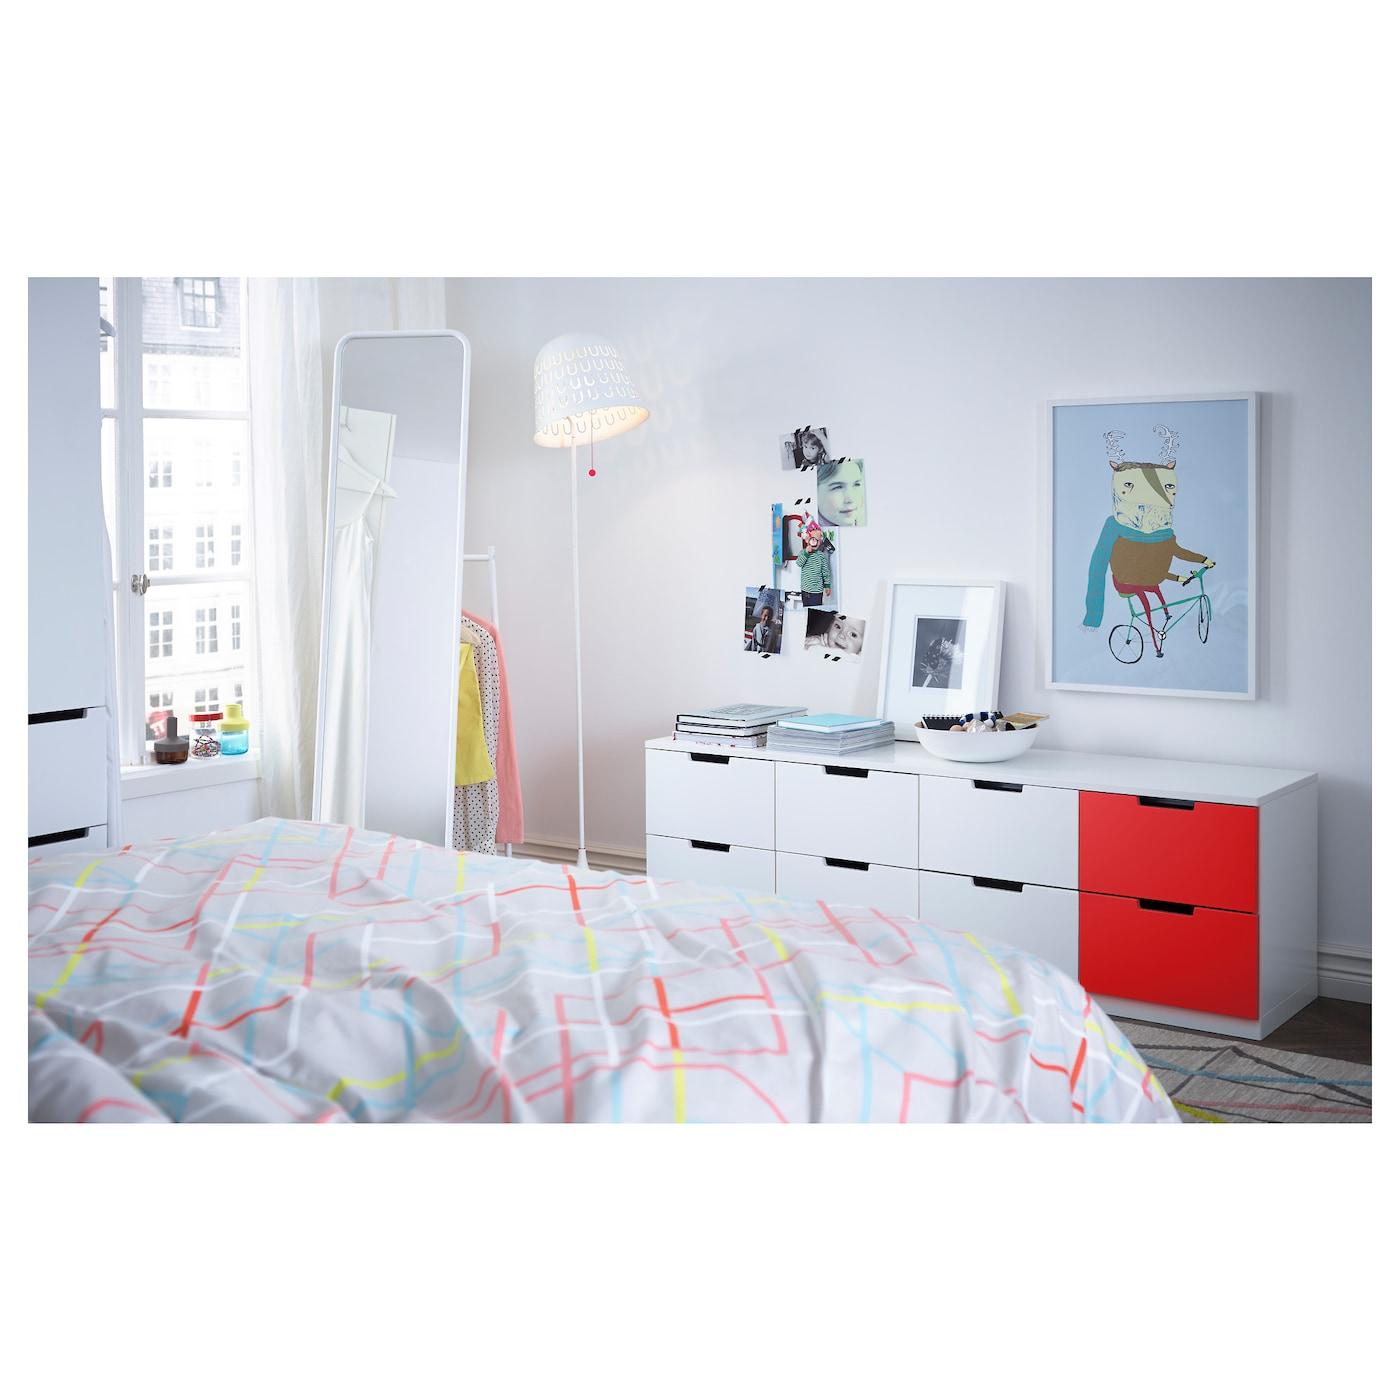 Penderie Ikea Portes Coulissantes ~ IKEA PS 2014 Floor lamp  IKEA